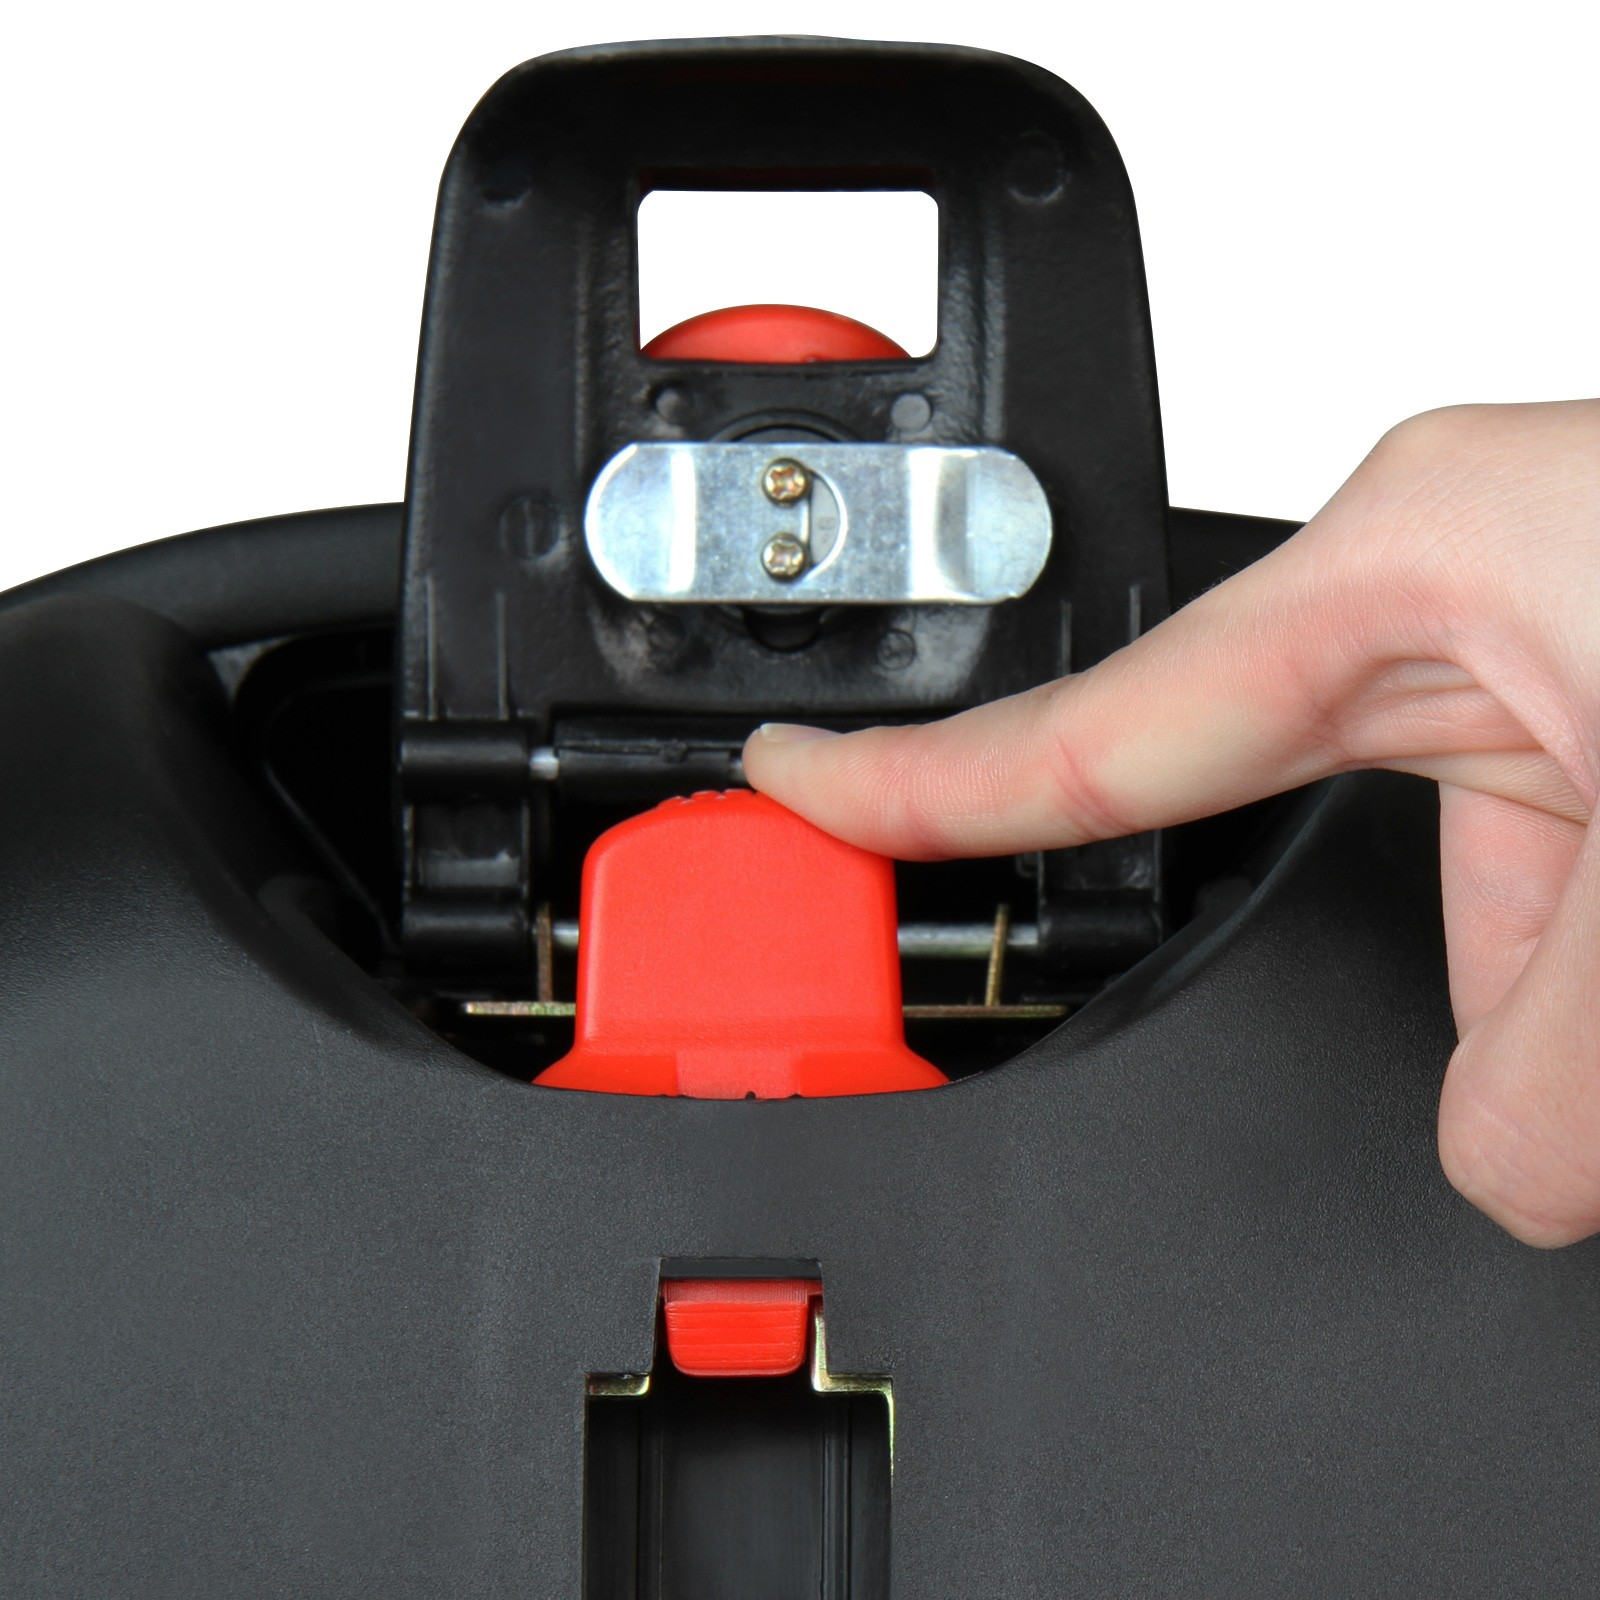 Topcase Roller Motorradzubeh/ör Top Box f/ür Helm Volumen 18 Liter Abnehmbarer TopCase Motorradkoffer Helmkoffer Bordeaux